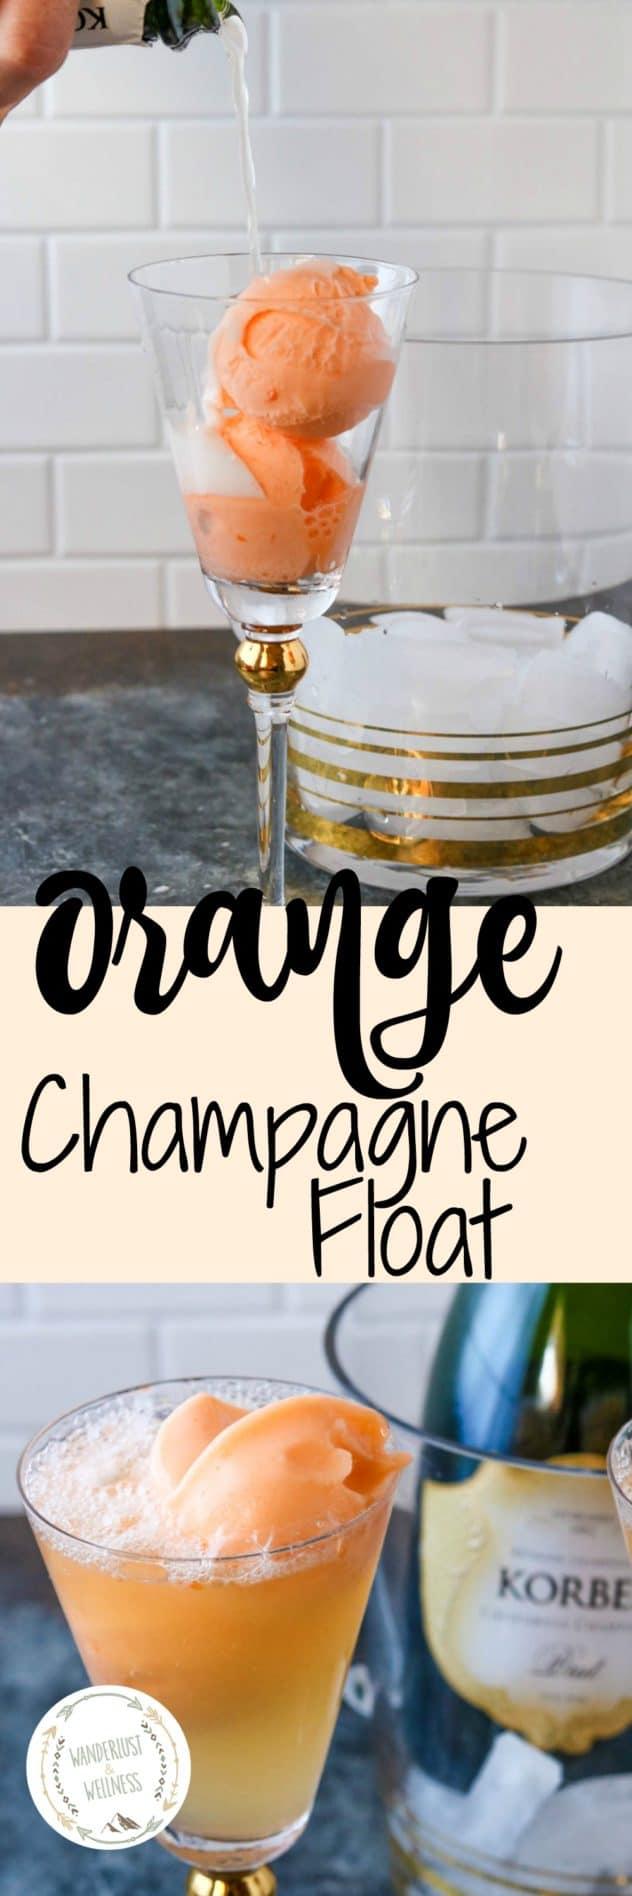 Orange Sherbet Champagne Float